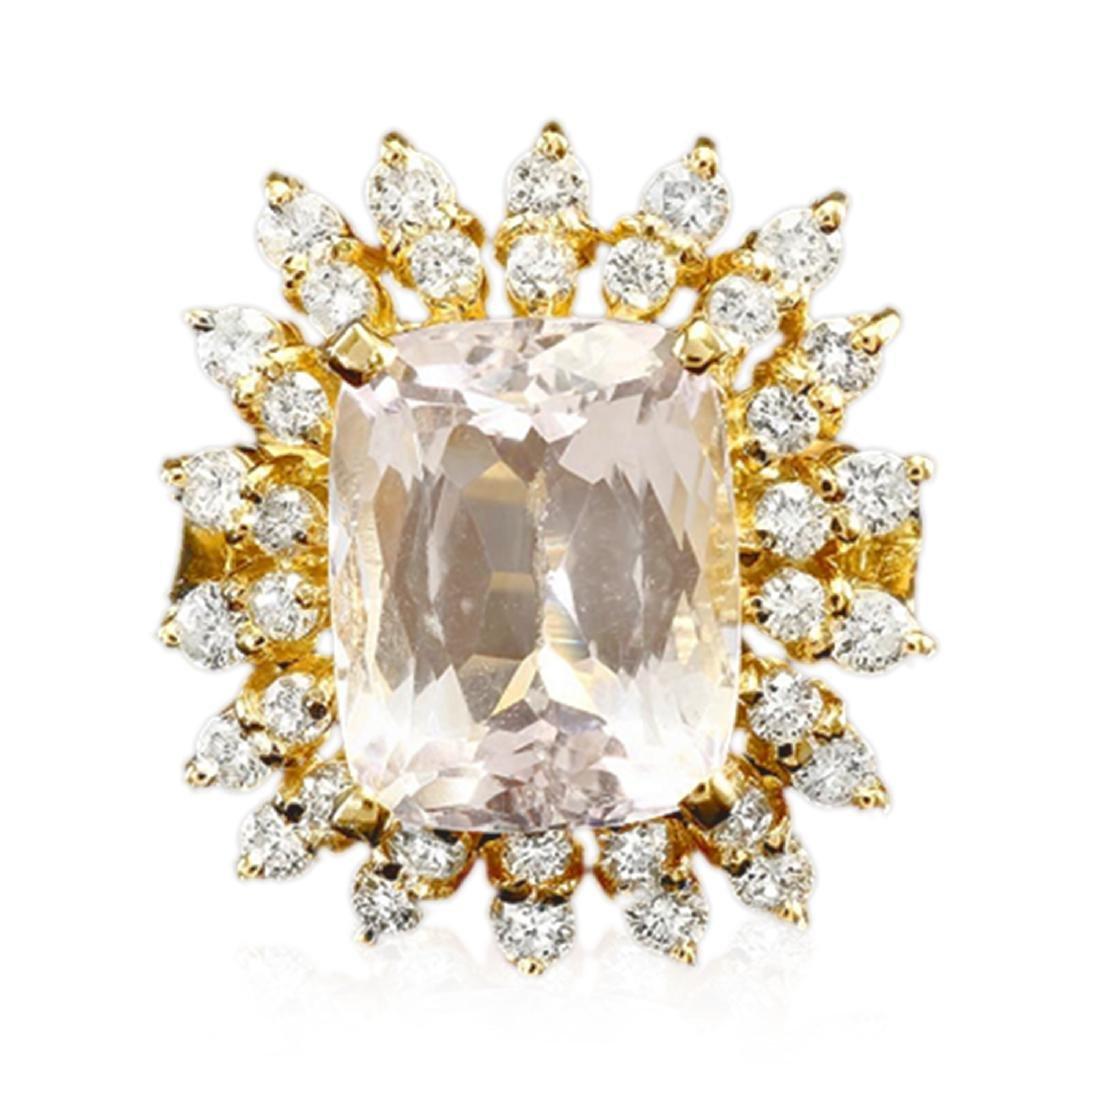 10.34 Carat Natural Kunzite 18K Solid Yellow Gold